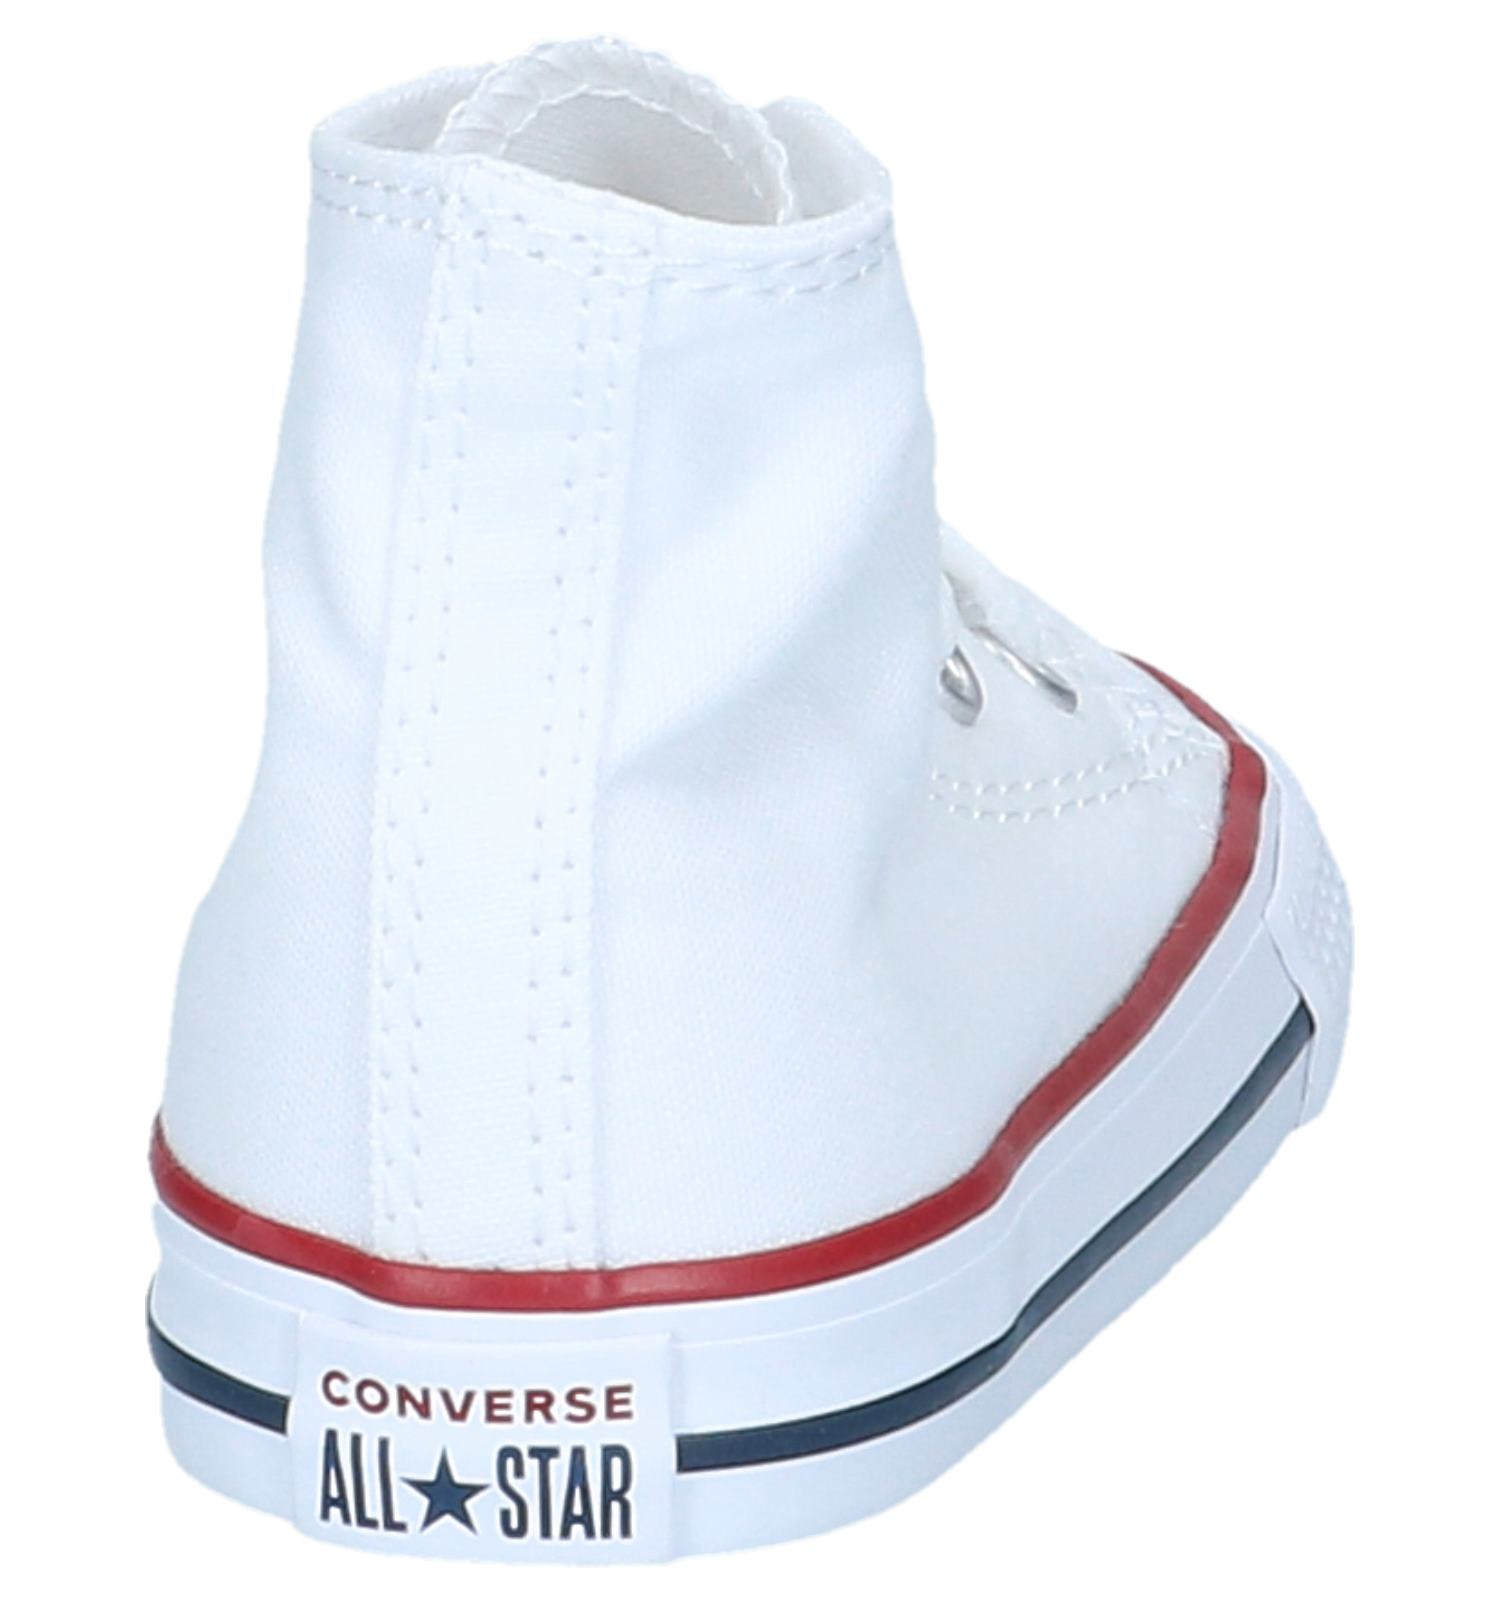 9984ca6b6d4 Hoge Witte Sneakers Converse CT All Star | TORFS.BE | Gratis verzend en  retour